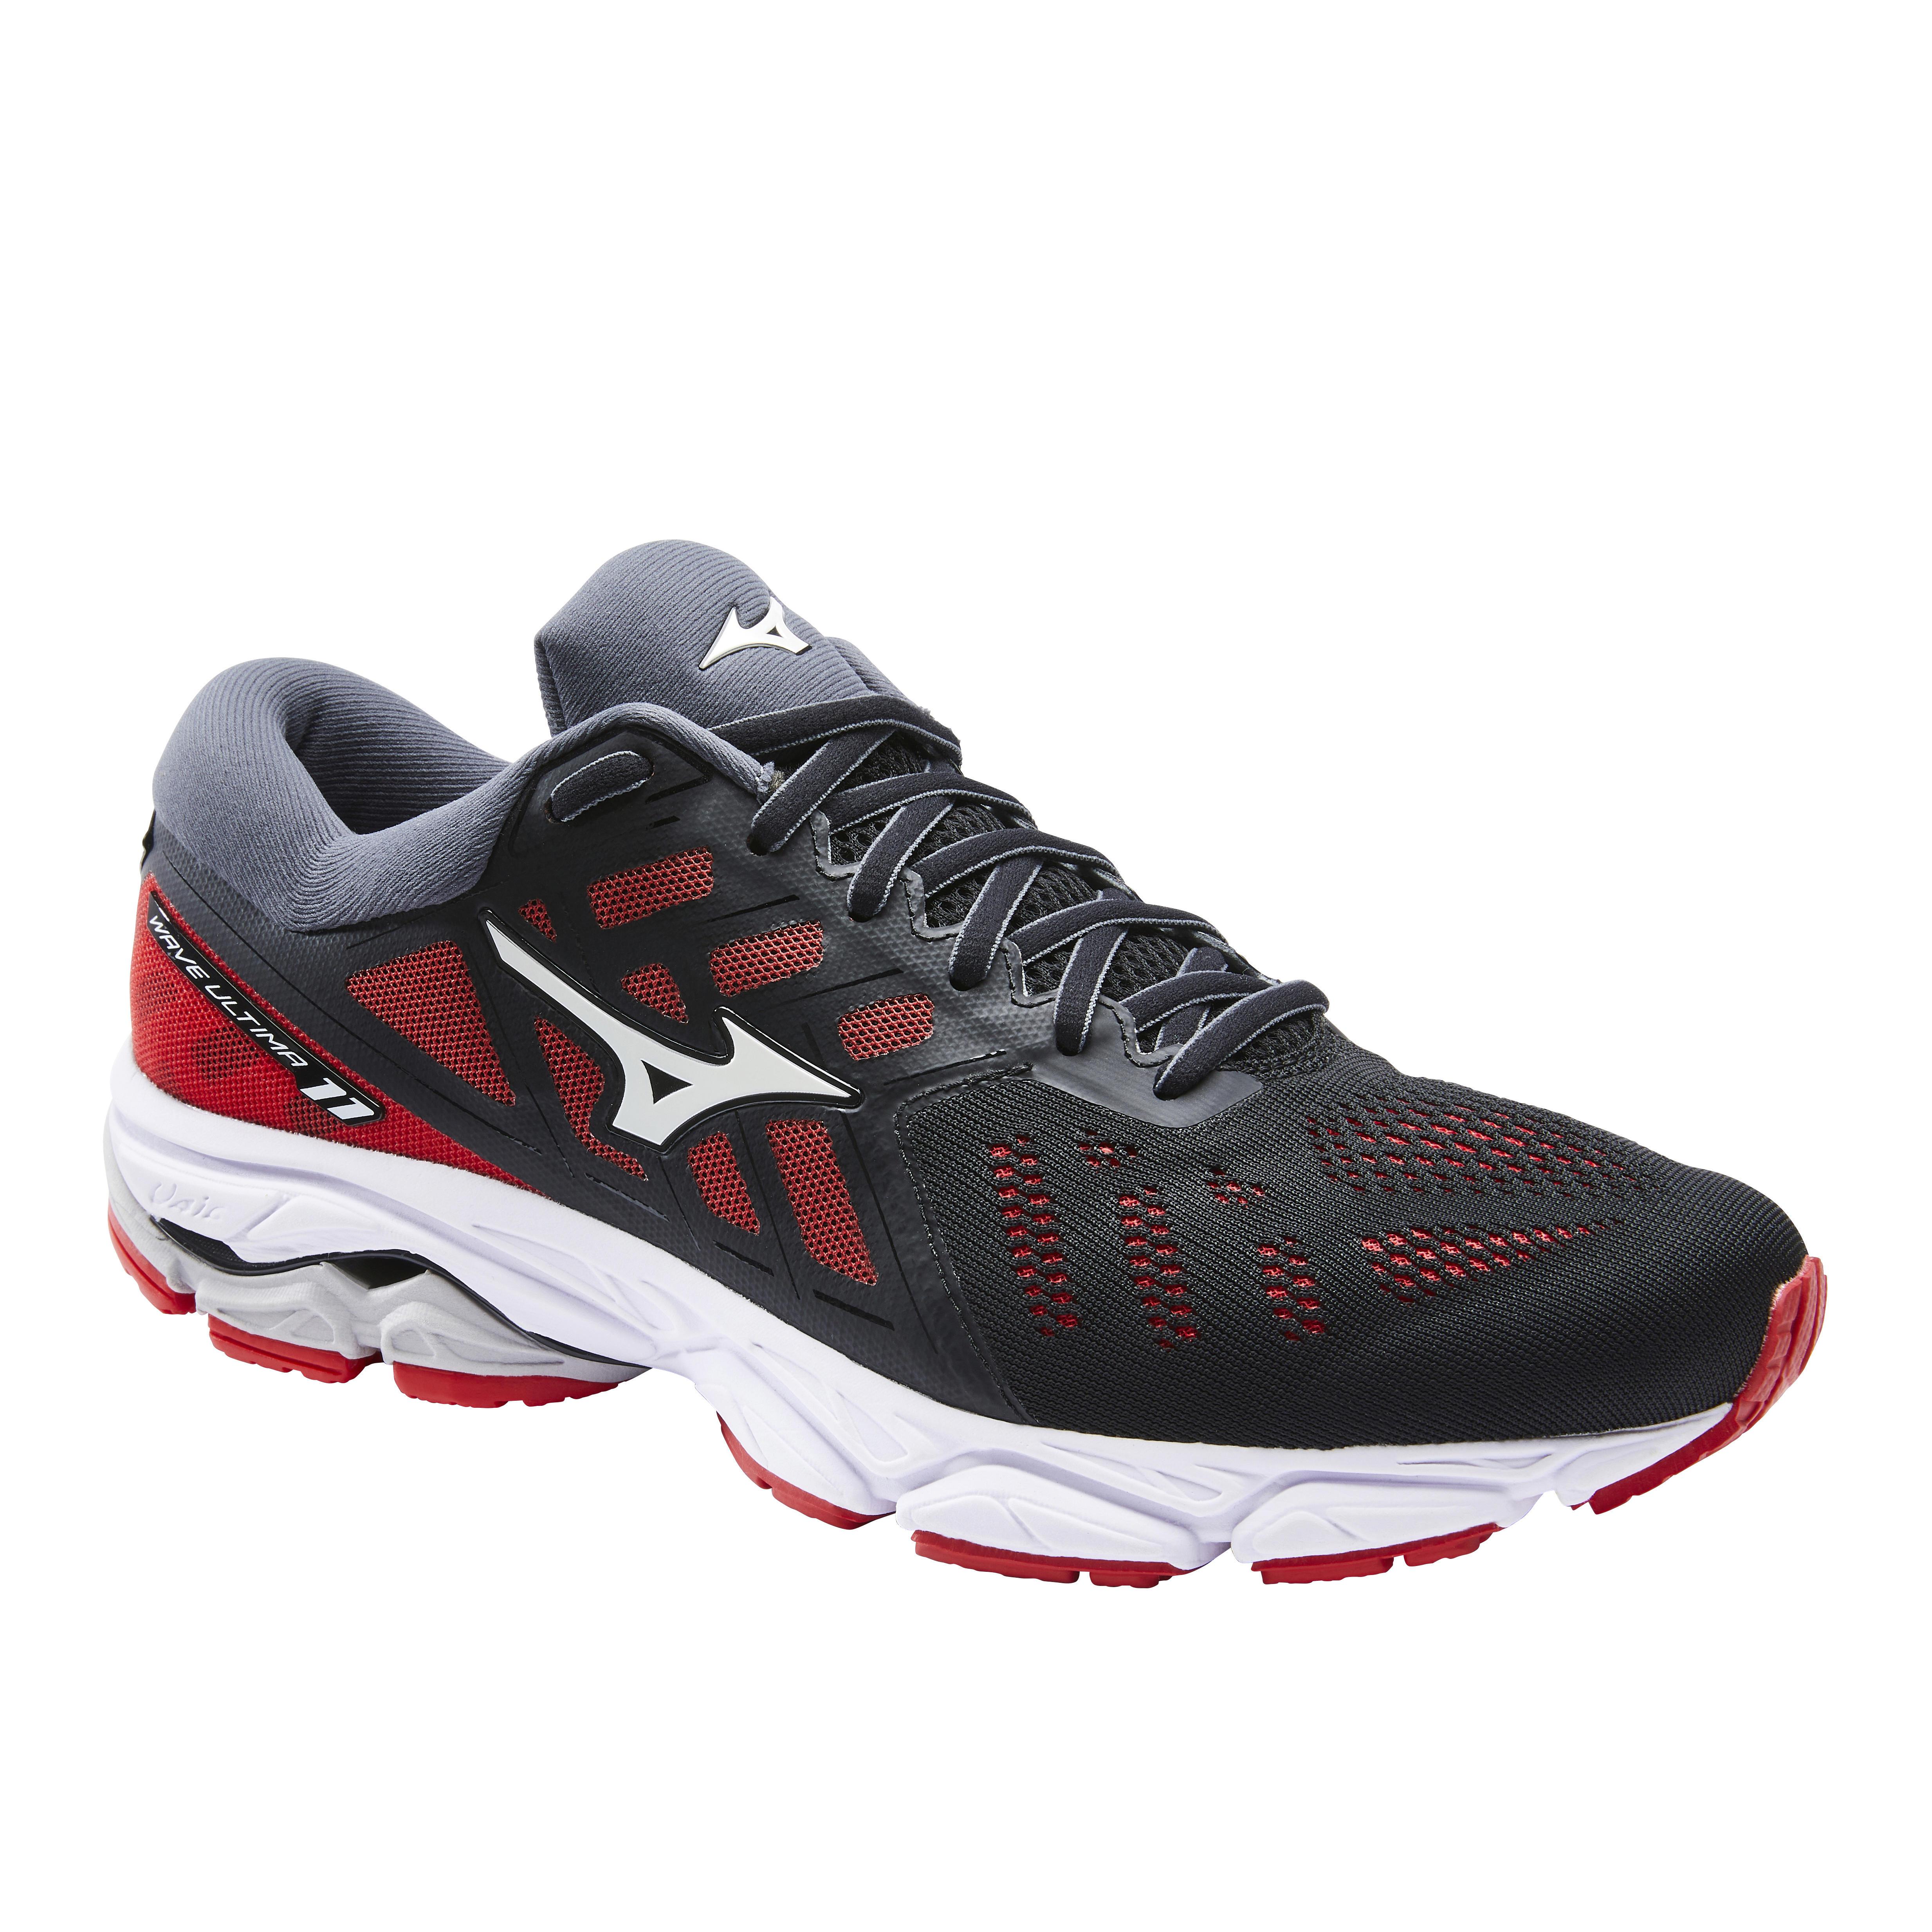 mizuno mens running shoes size 11 years football